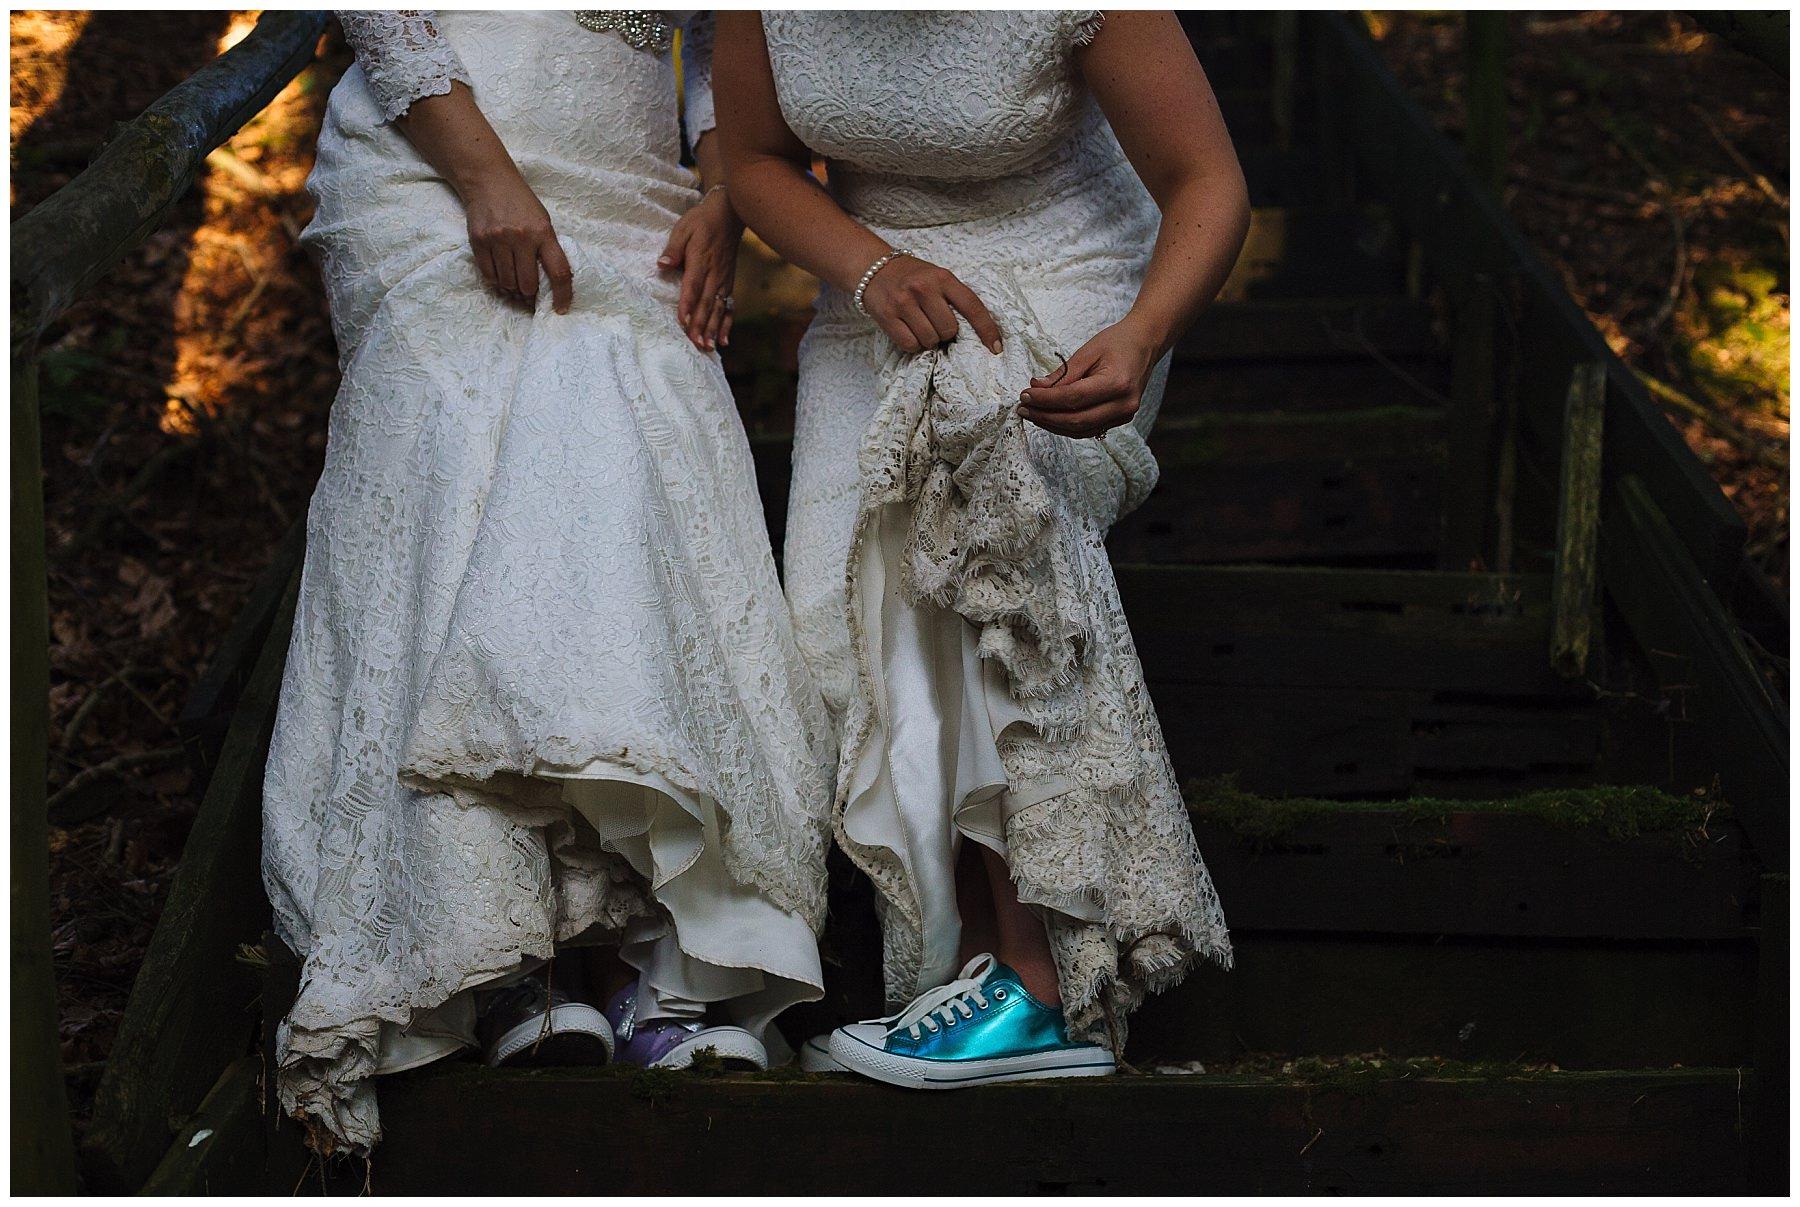 wedding converse inspiration